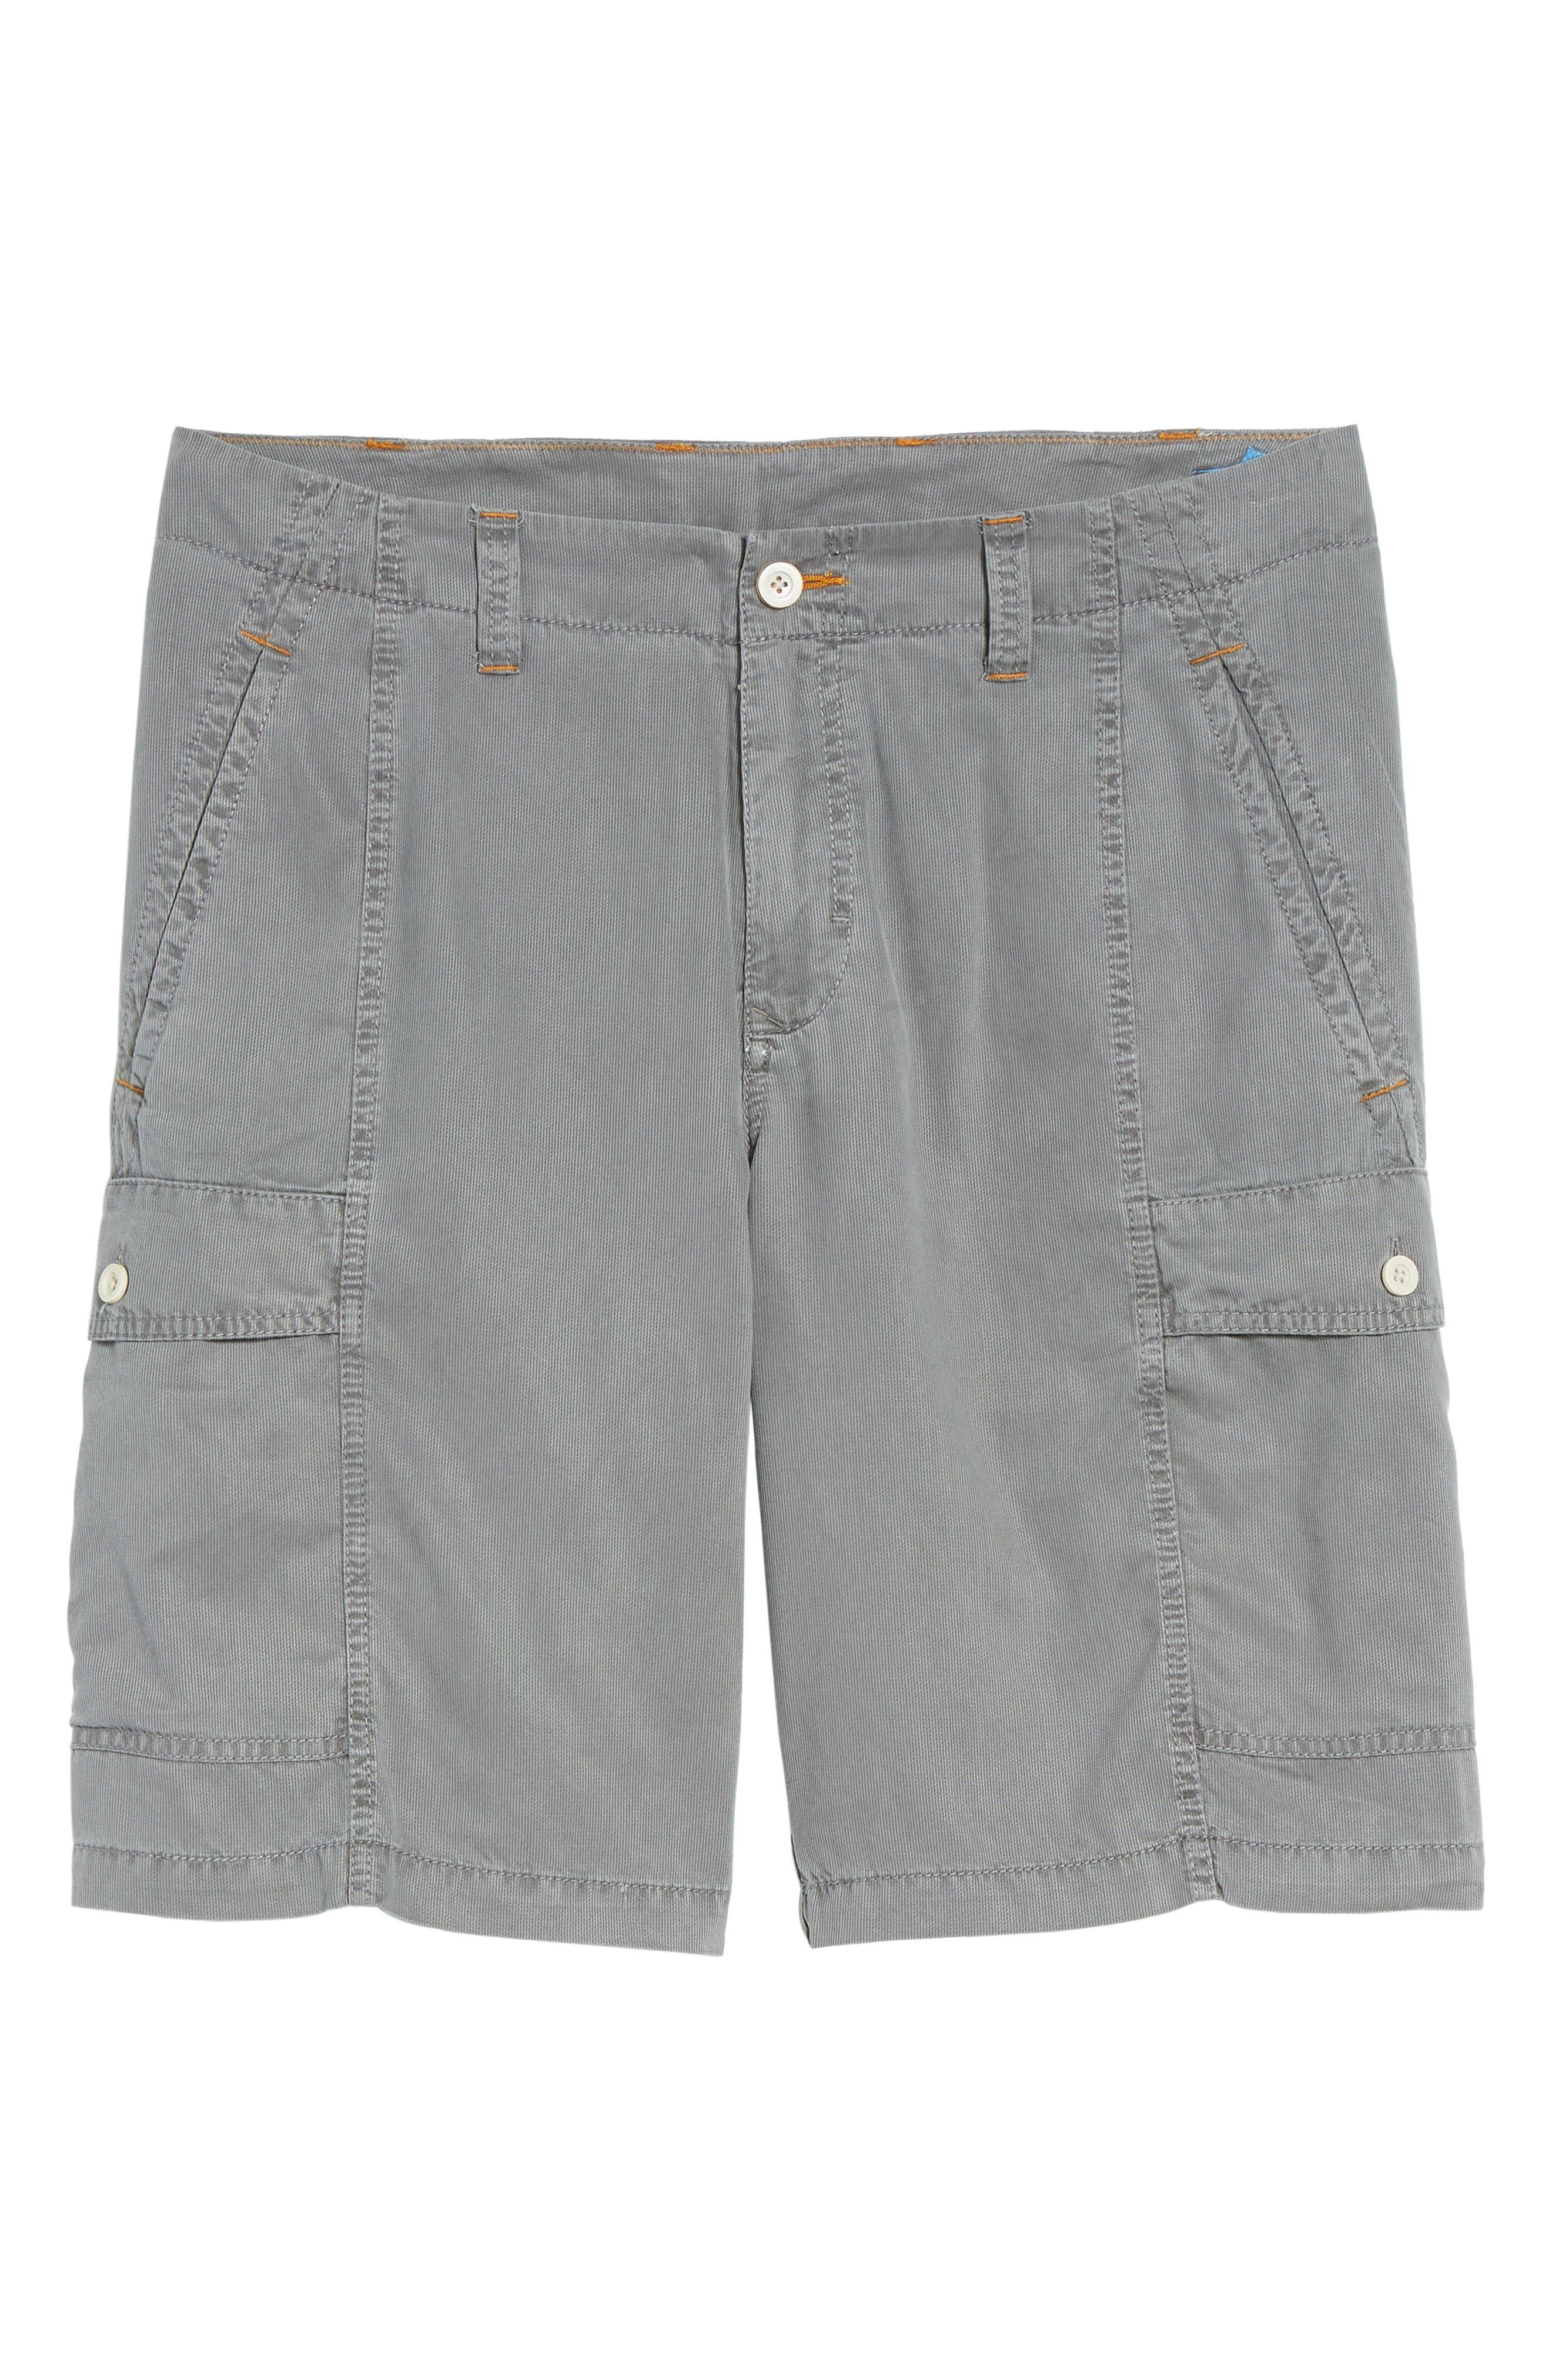 'Beachfront Kihei' Cargo Shorts,                             Alternate thumbnail 2, color,                             050